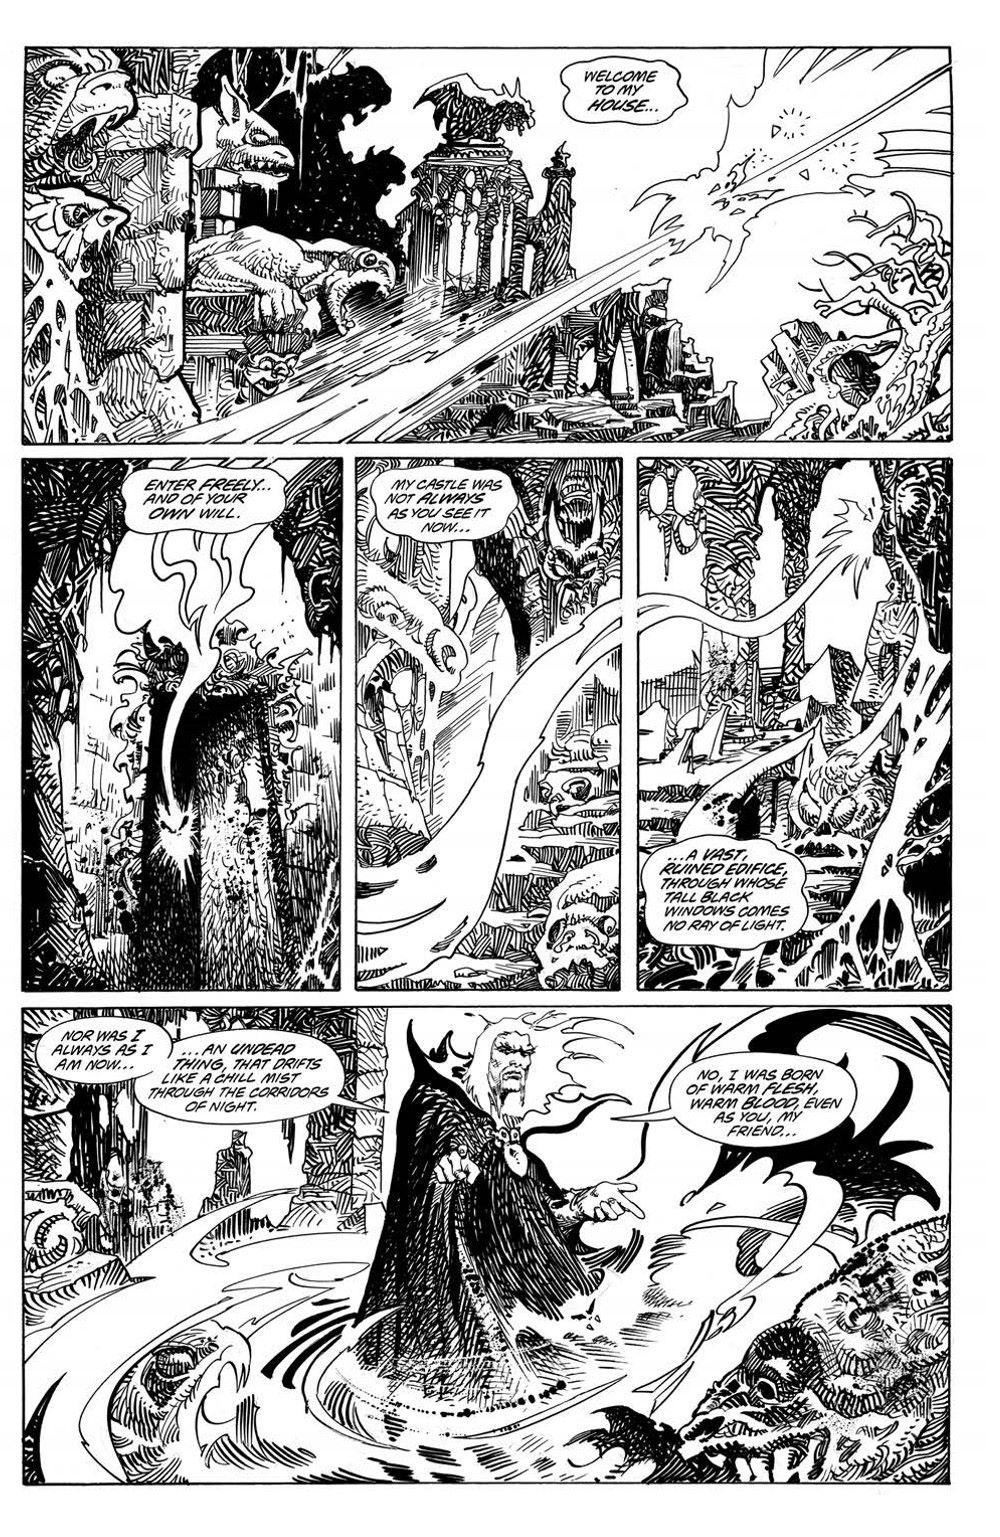 VladTheImpaler_TPB_pr-4 ComicList Previews: DRACULA VLAD THE IMPALER GN